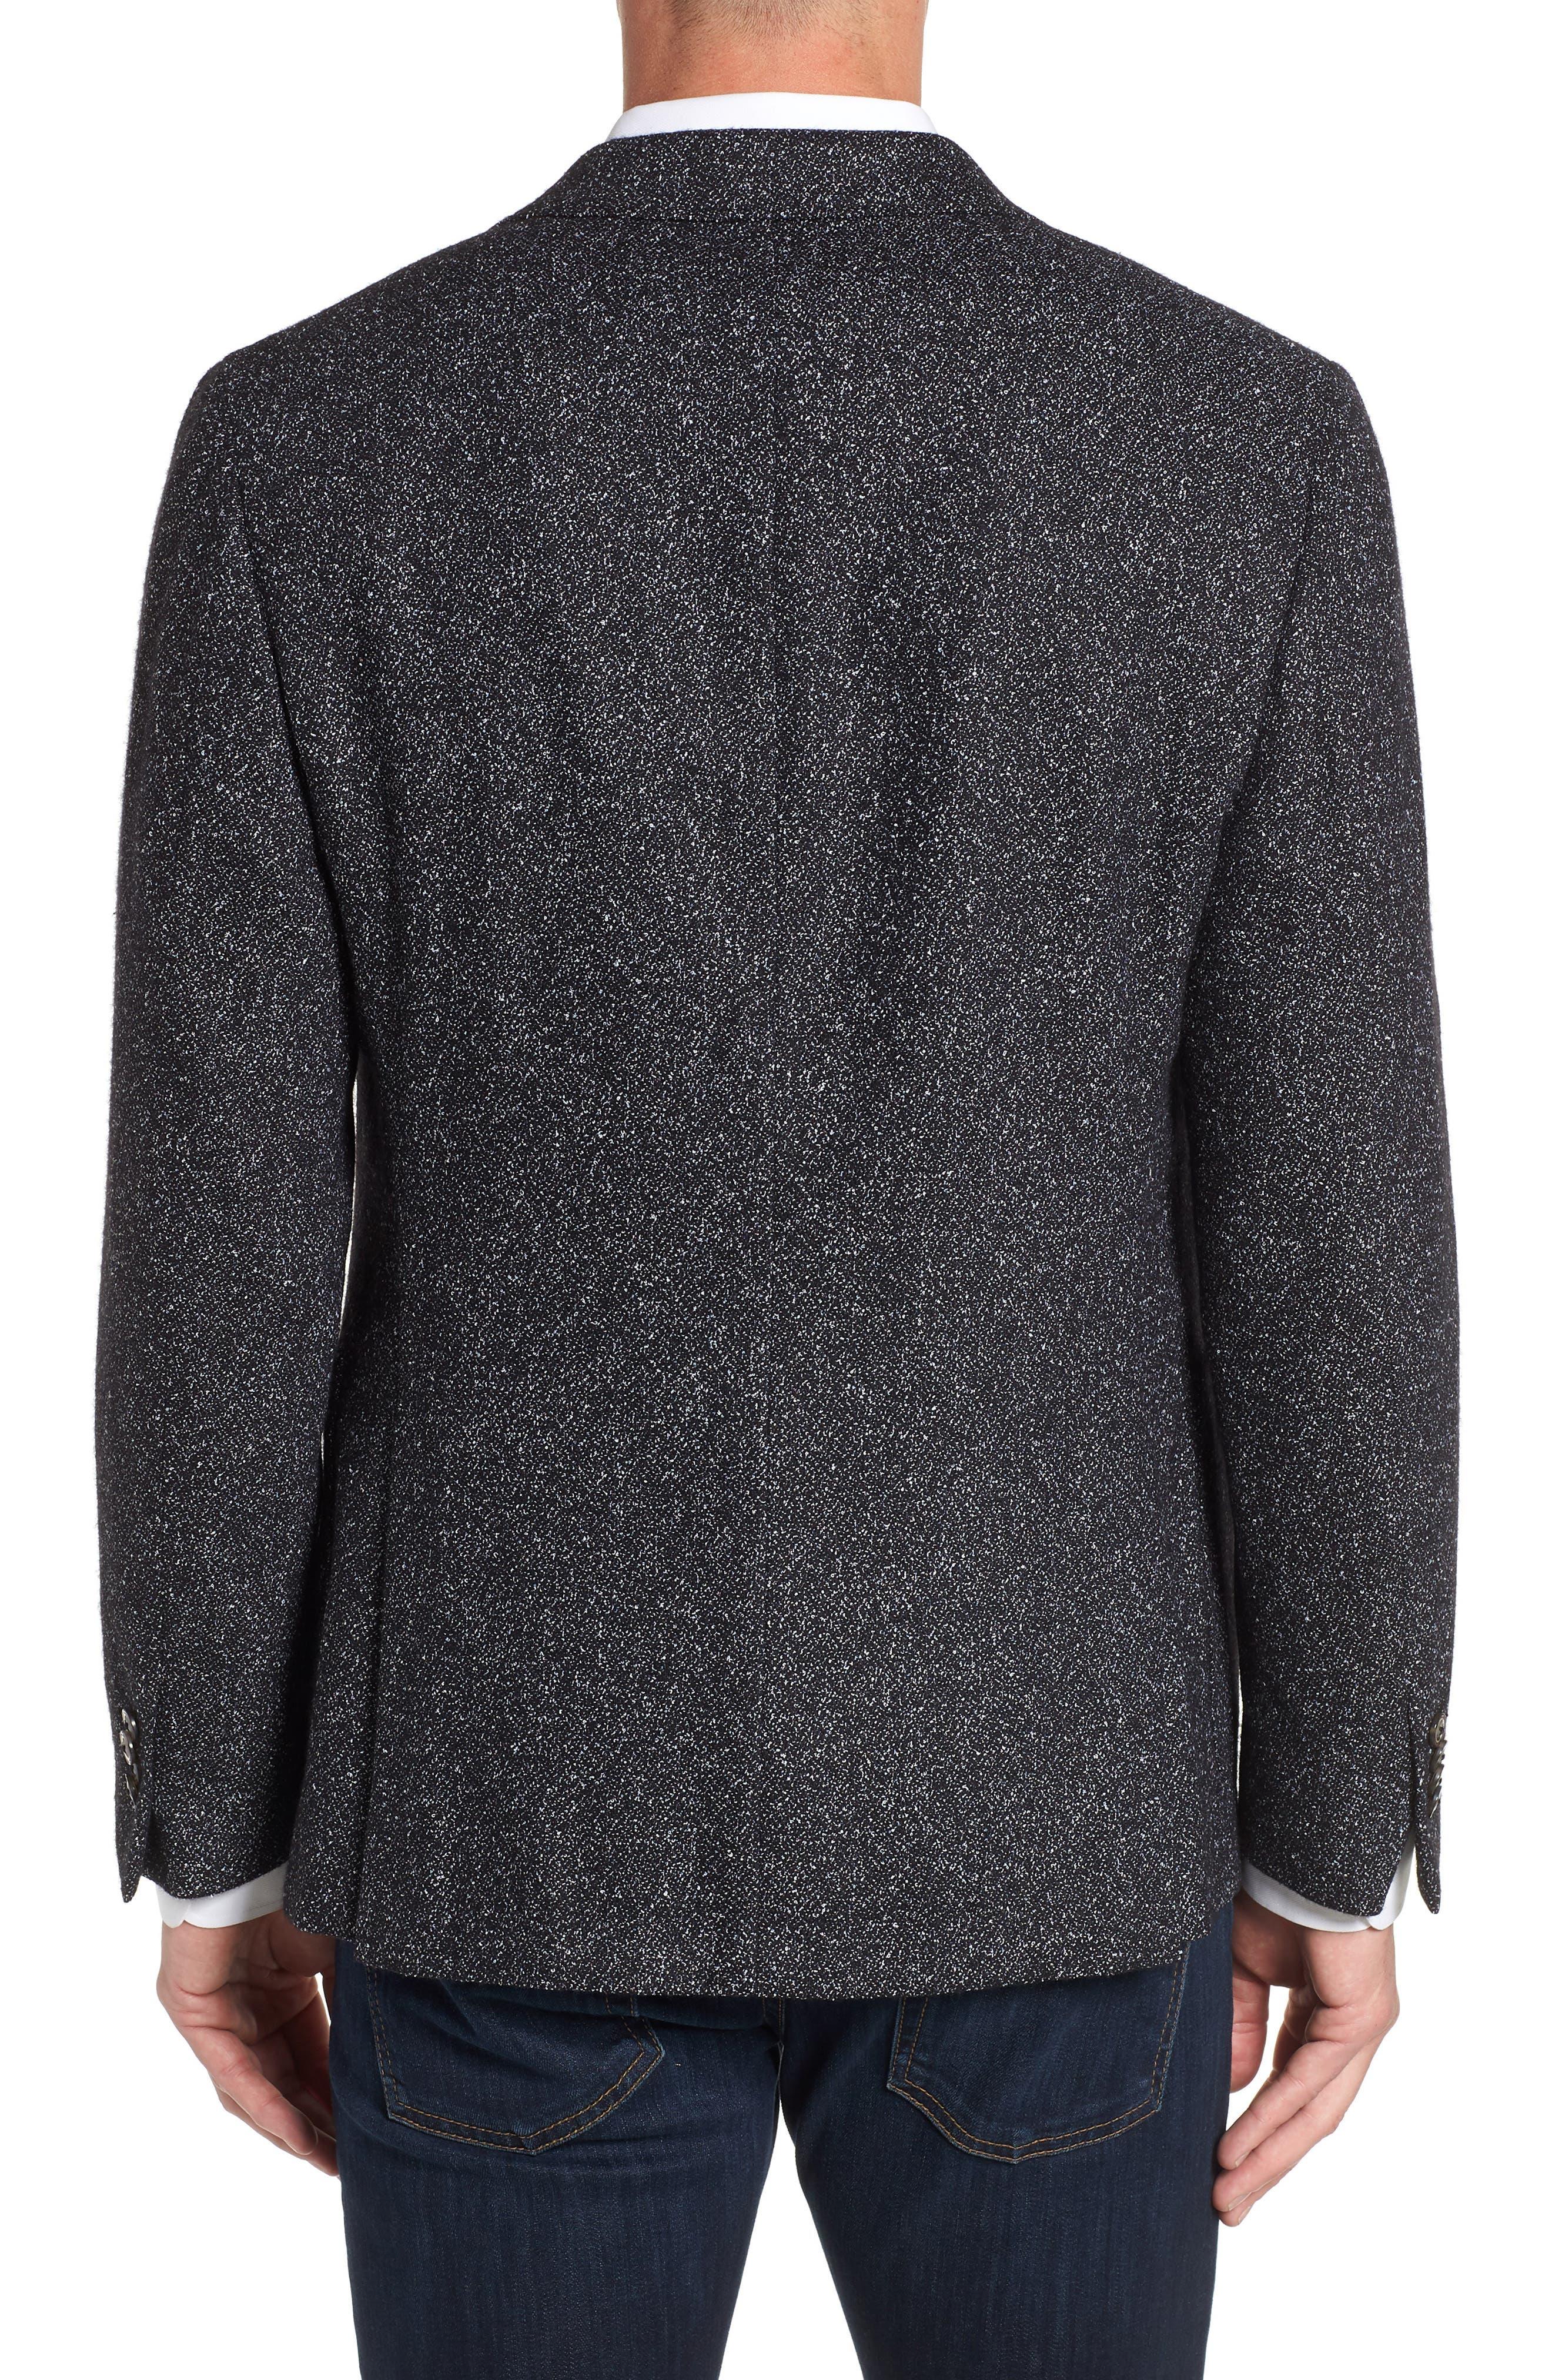 Chester Tailored Fit Sport Coat,                             Alternate thumbnail 2, color,                             BLACK